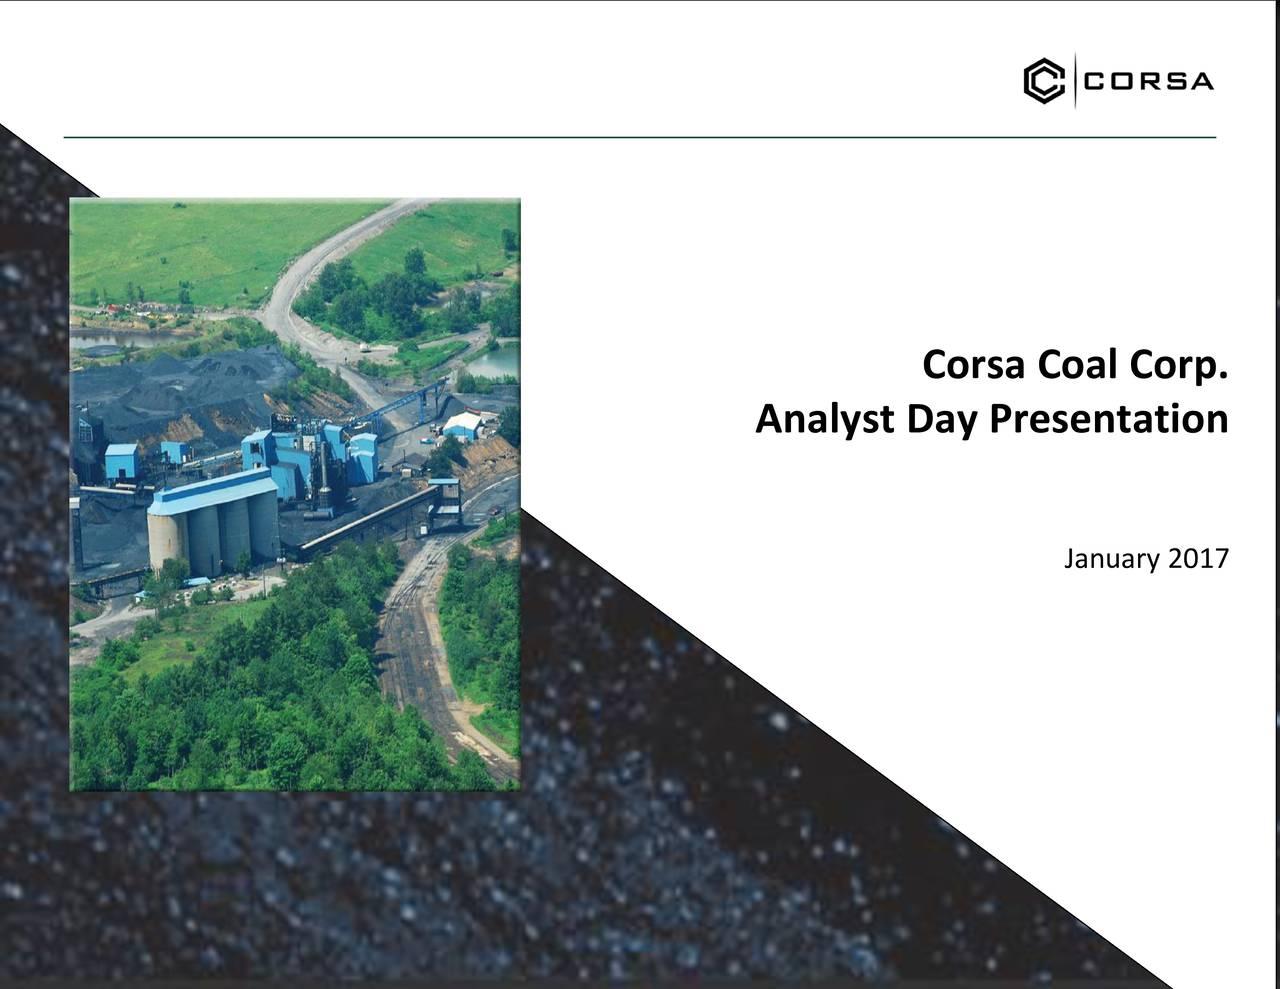 Analyst Day Presentation January 2017